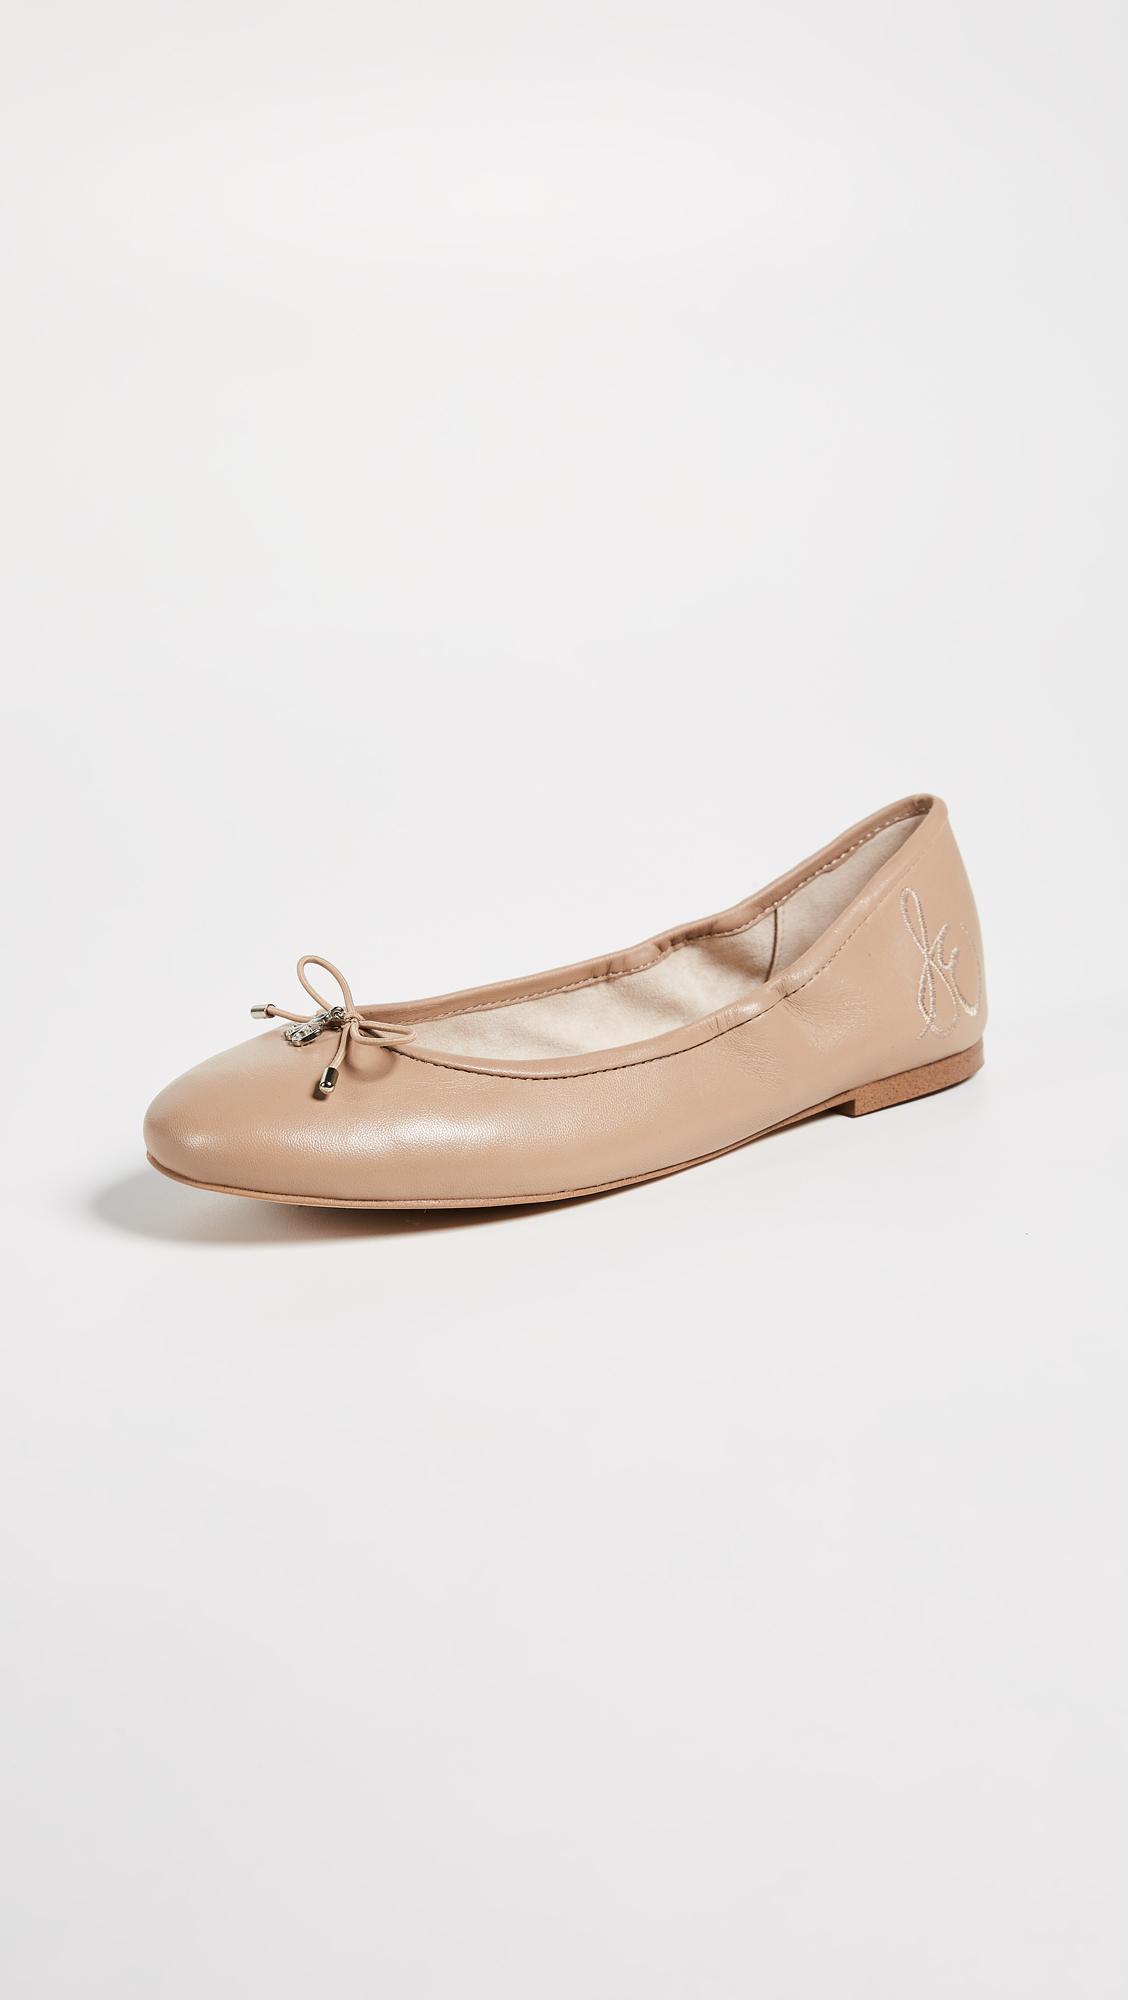 womens lite new ballet comforter skechers stardust itm flats comfortable go step